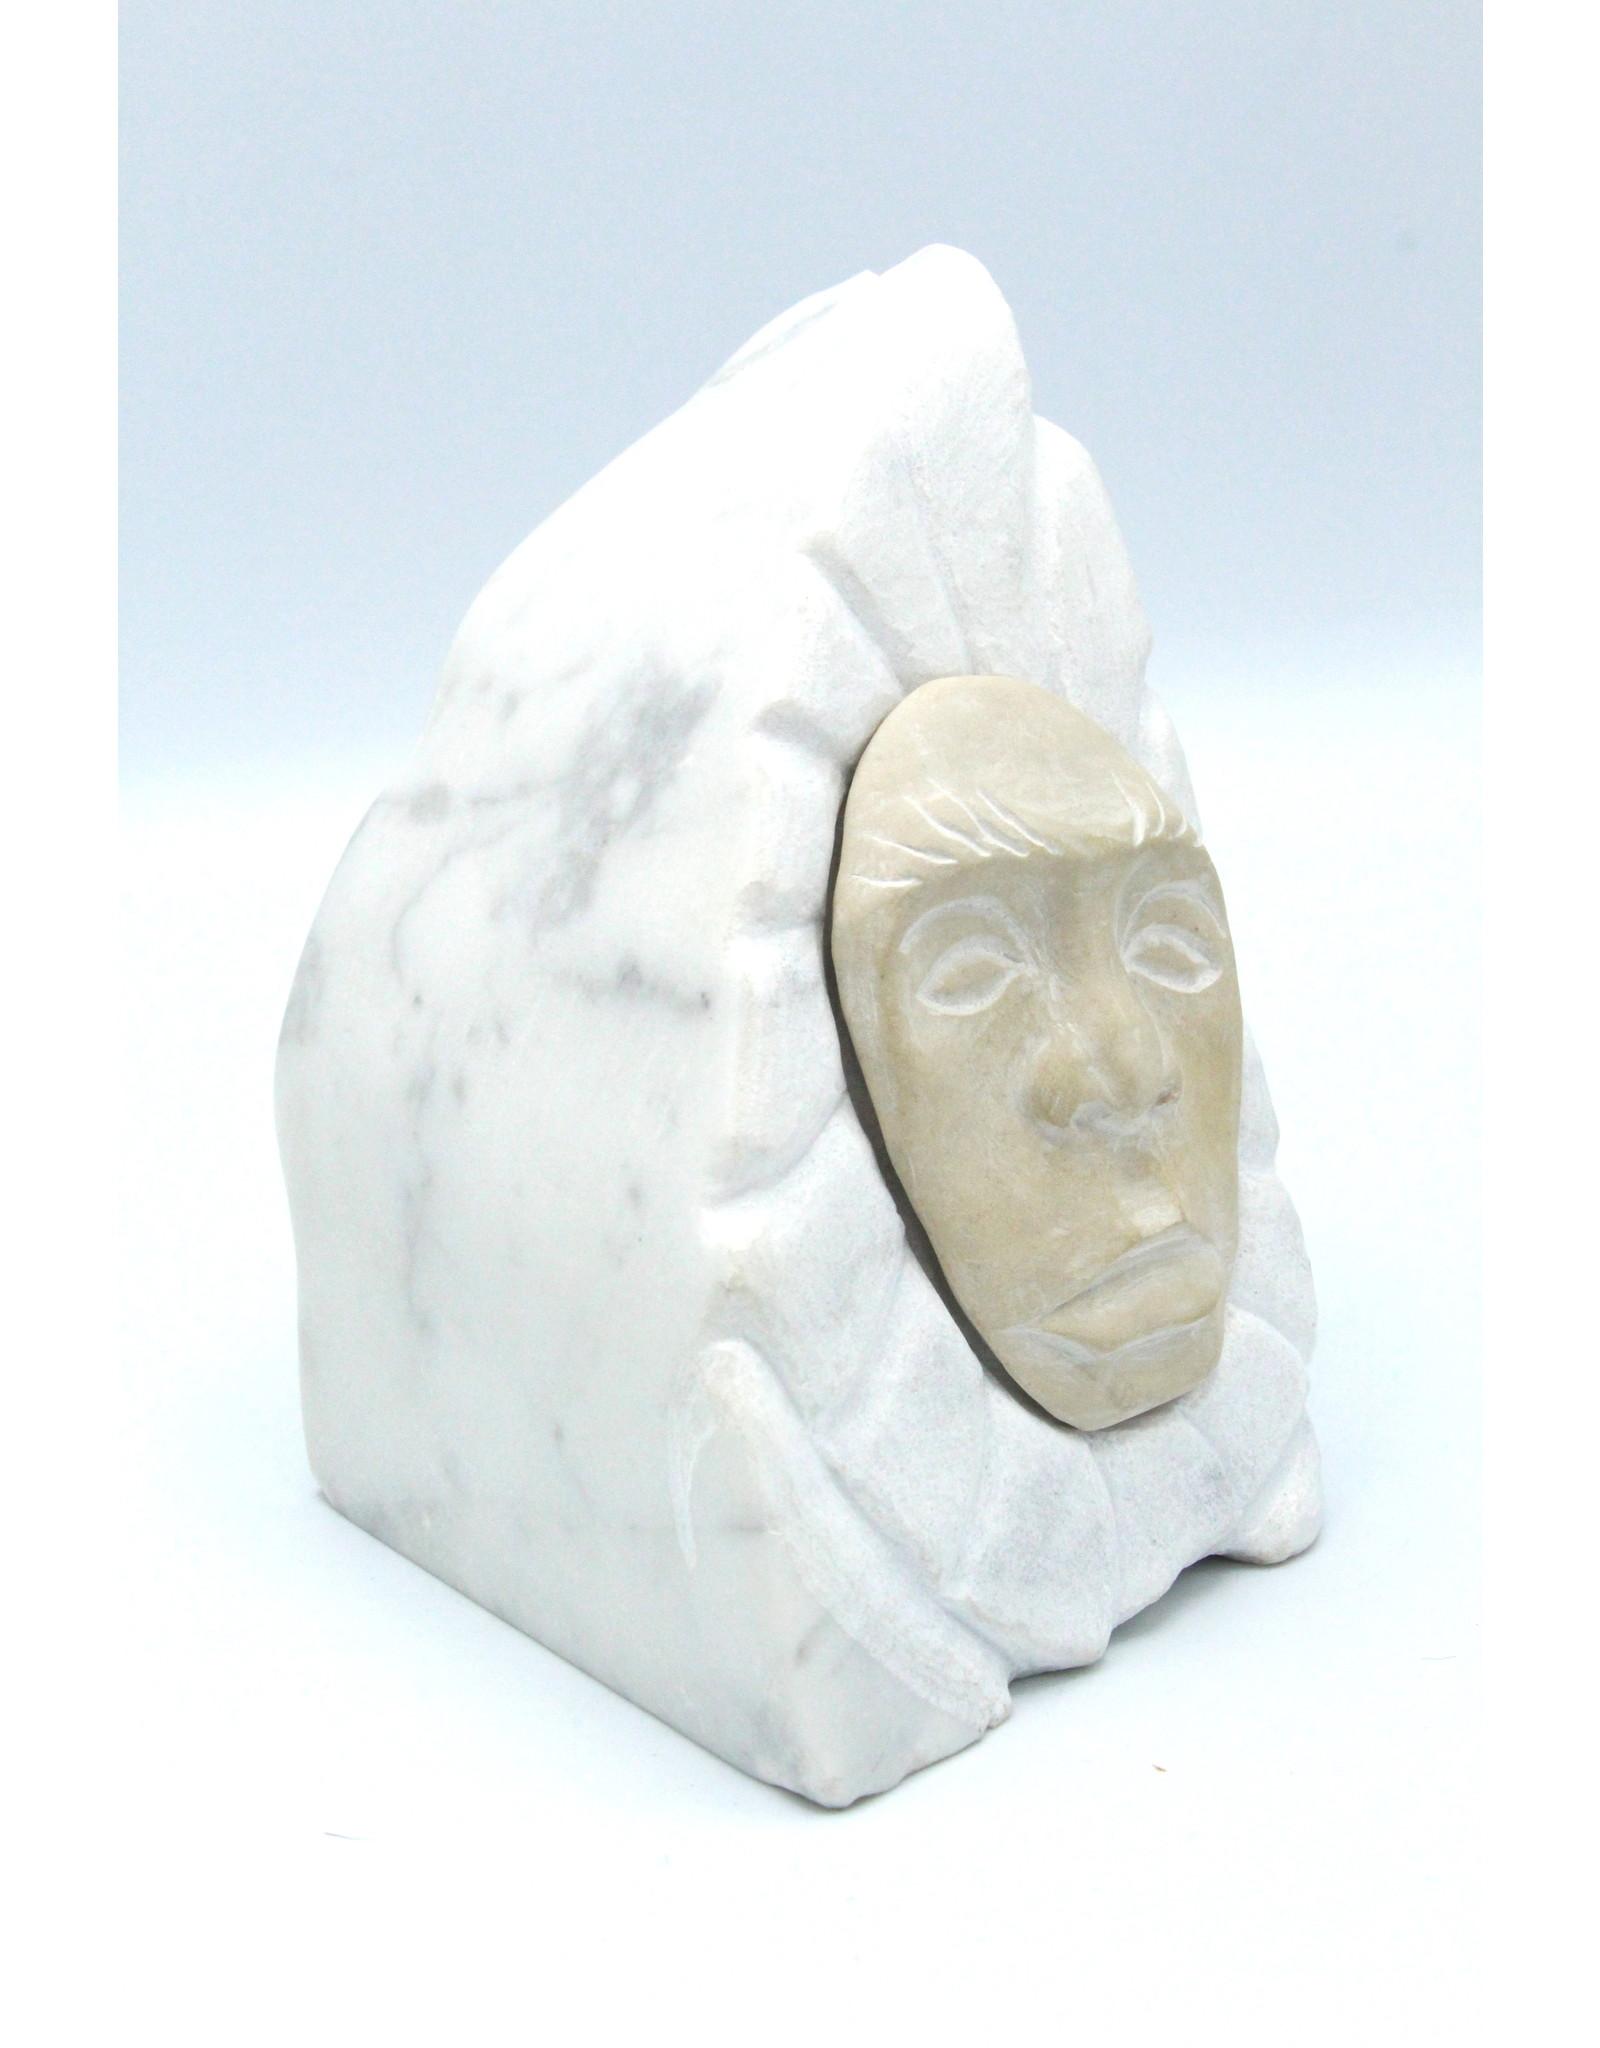 866001734  Face by Scott Goudie